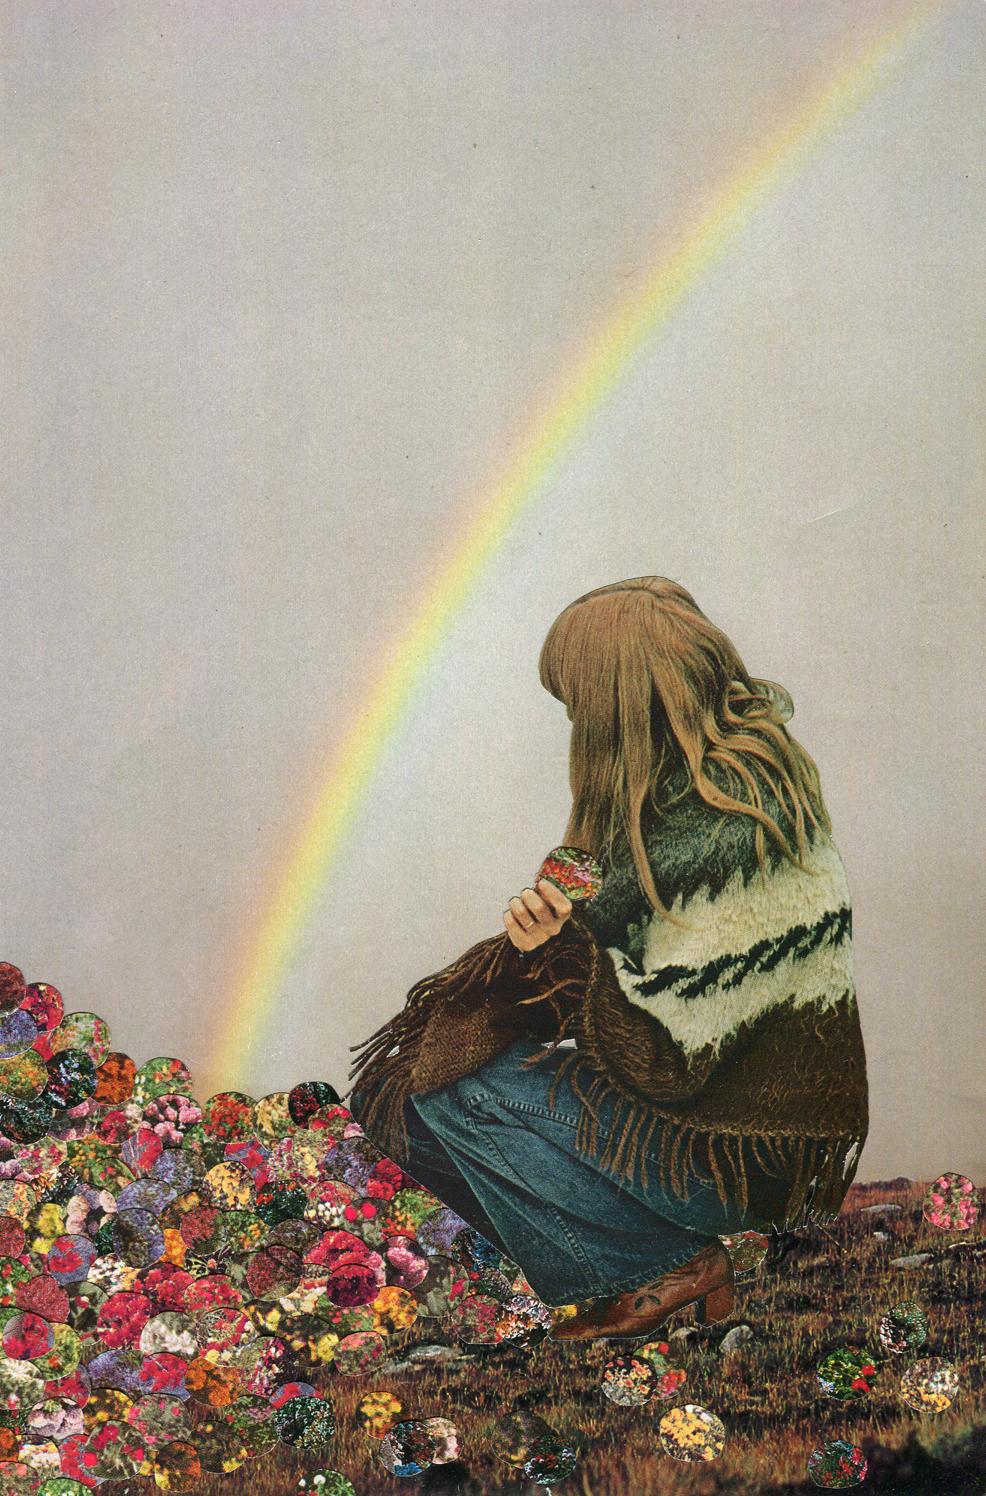 Unearthing Rainbows, 2016